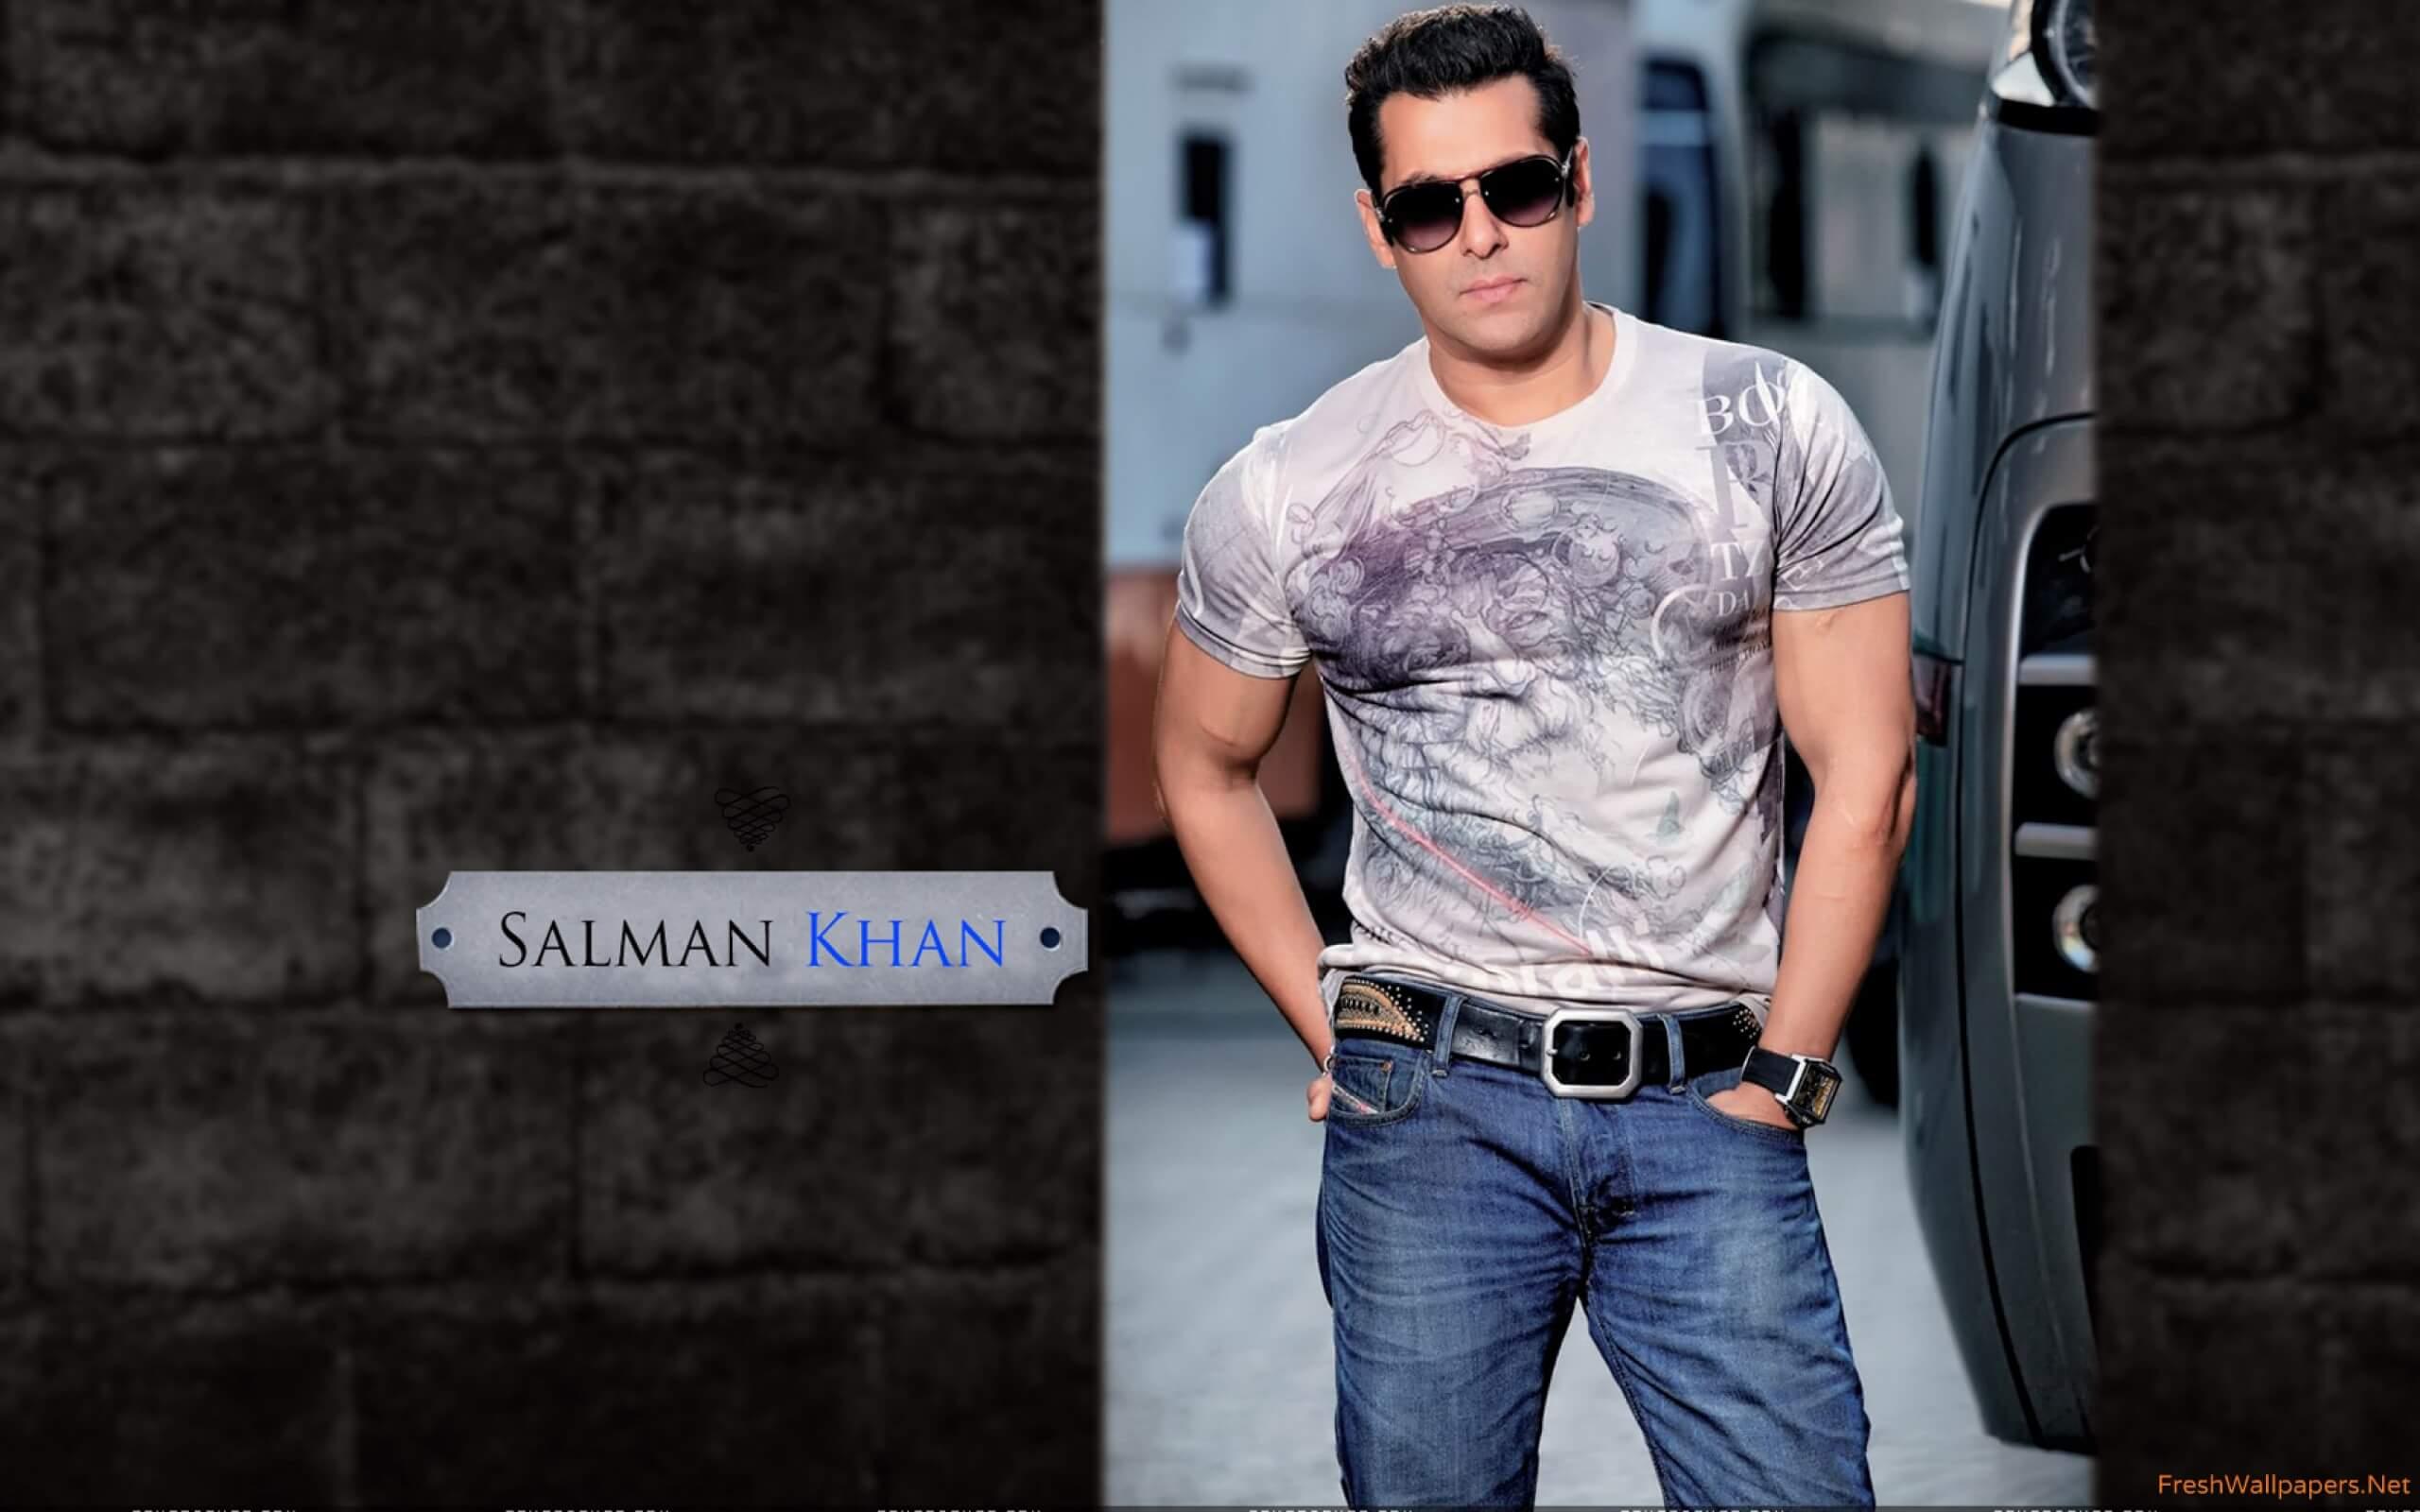 Salman Khan Photo, Age, News, Birthday, Height, Sister, Biography, Girlfriend, Awards, Address, Song, Video, Net Worth, Education, Twitter, Instagram, Facebook, Wiki, Imdb, Website, Youtube (15)